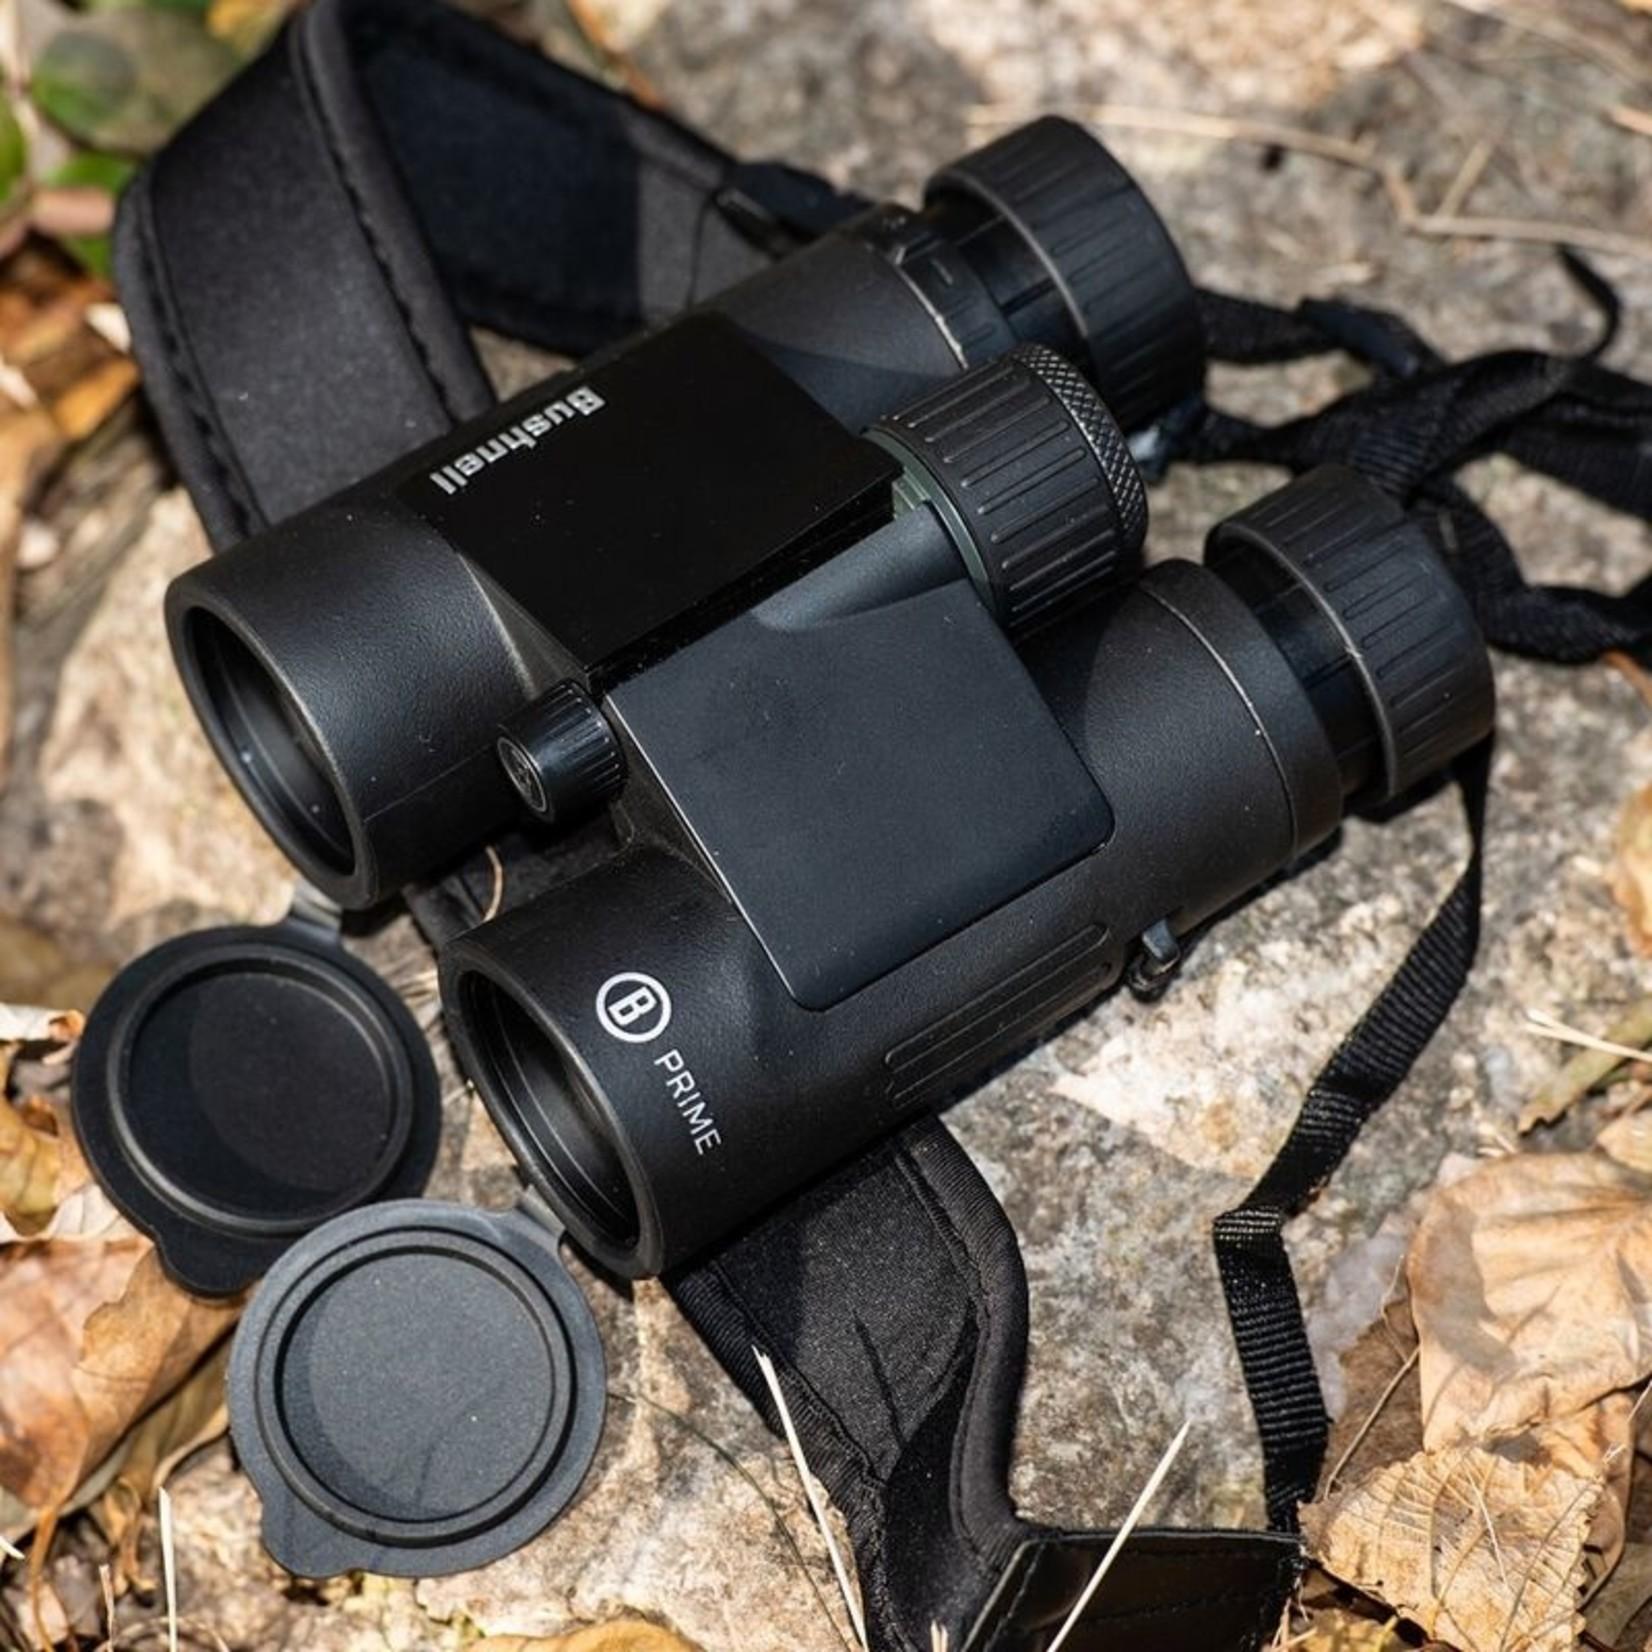 Bushnell Binoculars 8x42 Black Roof Prism FMC, WP/FP, Twist-up Eyecups